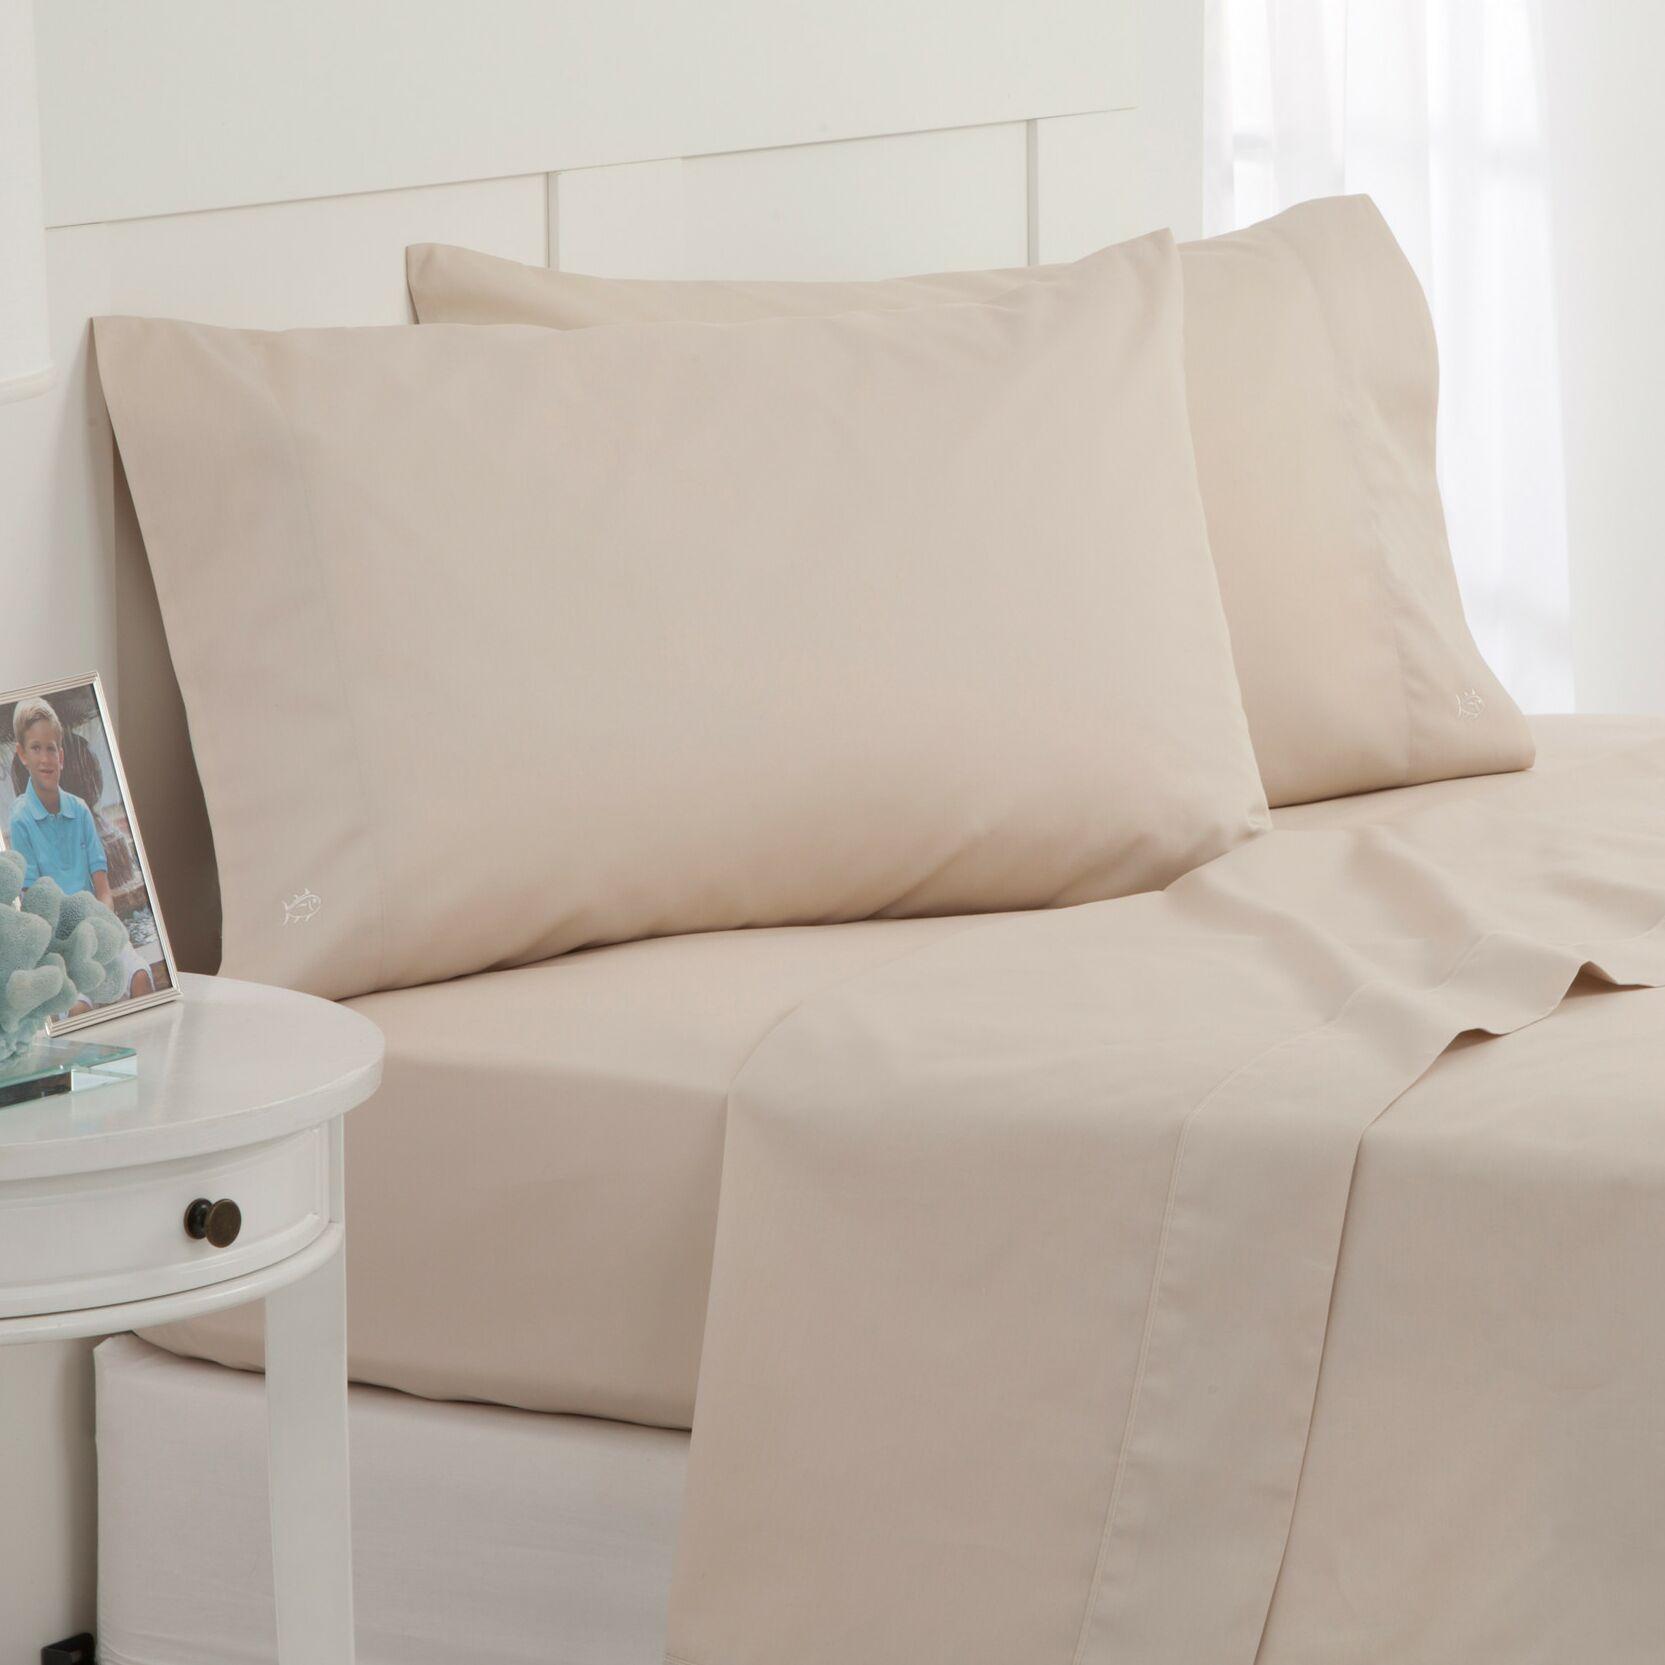 Skipjack 300 Thread Count 100% Cotton Sheet Set Color: Sand, Size: King